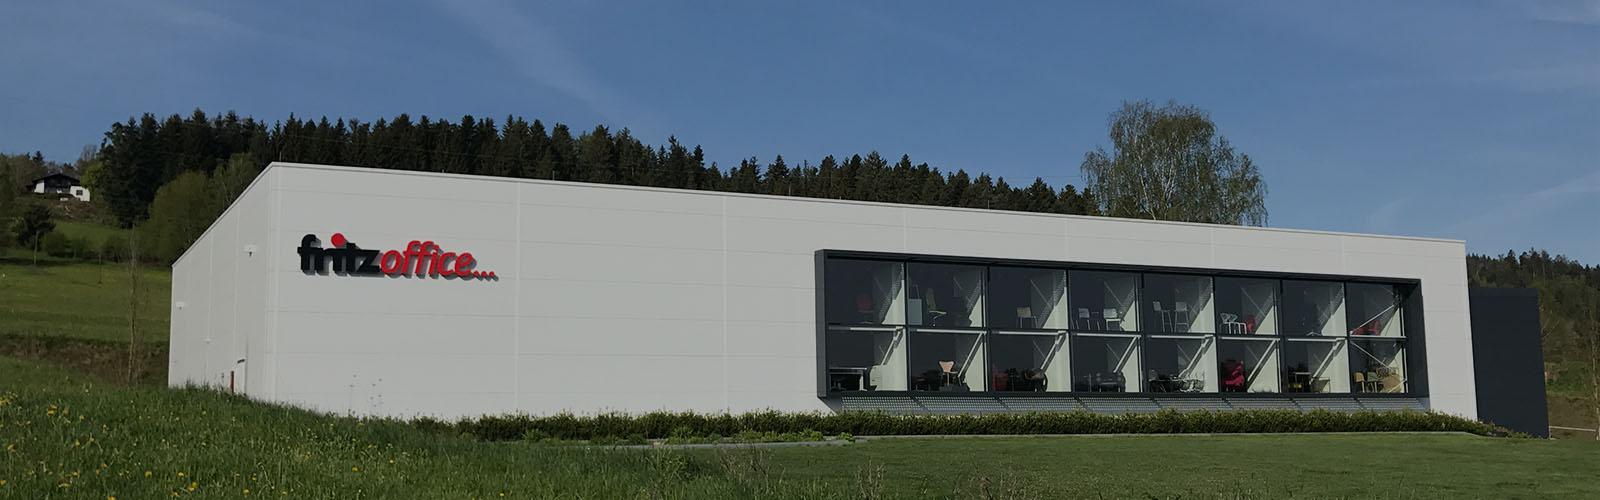 Industrie Gewerbe, Fritz Office